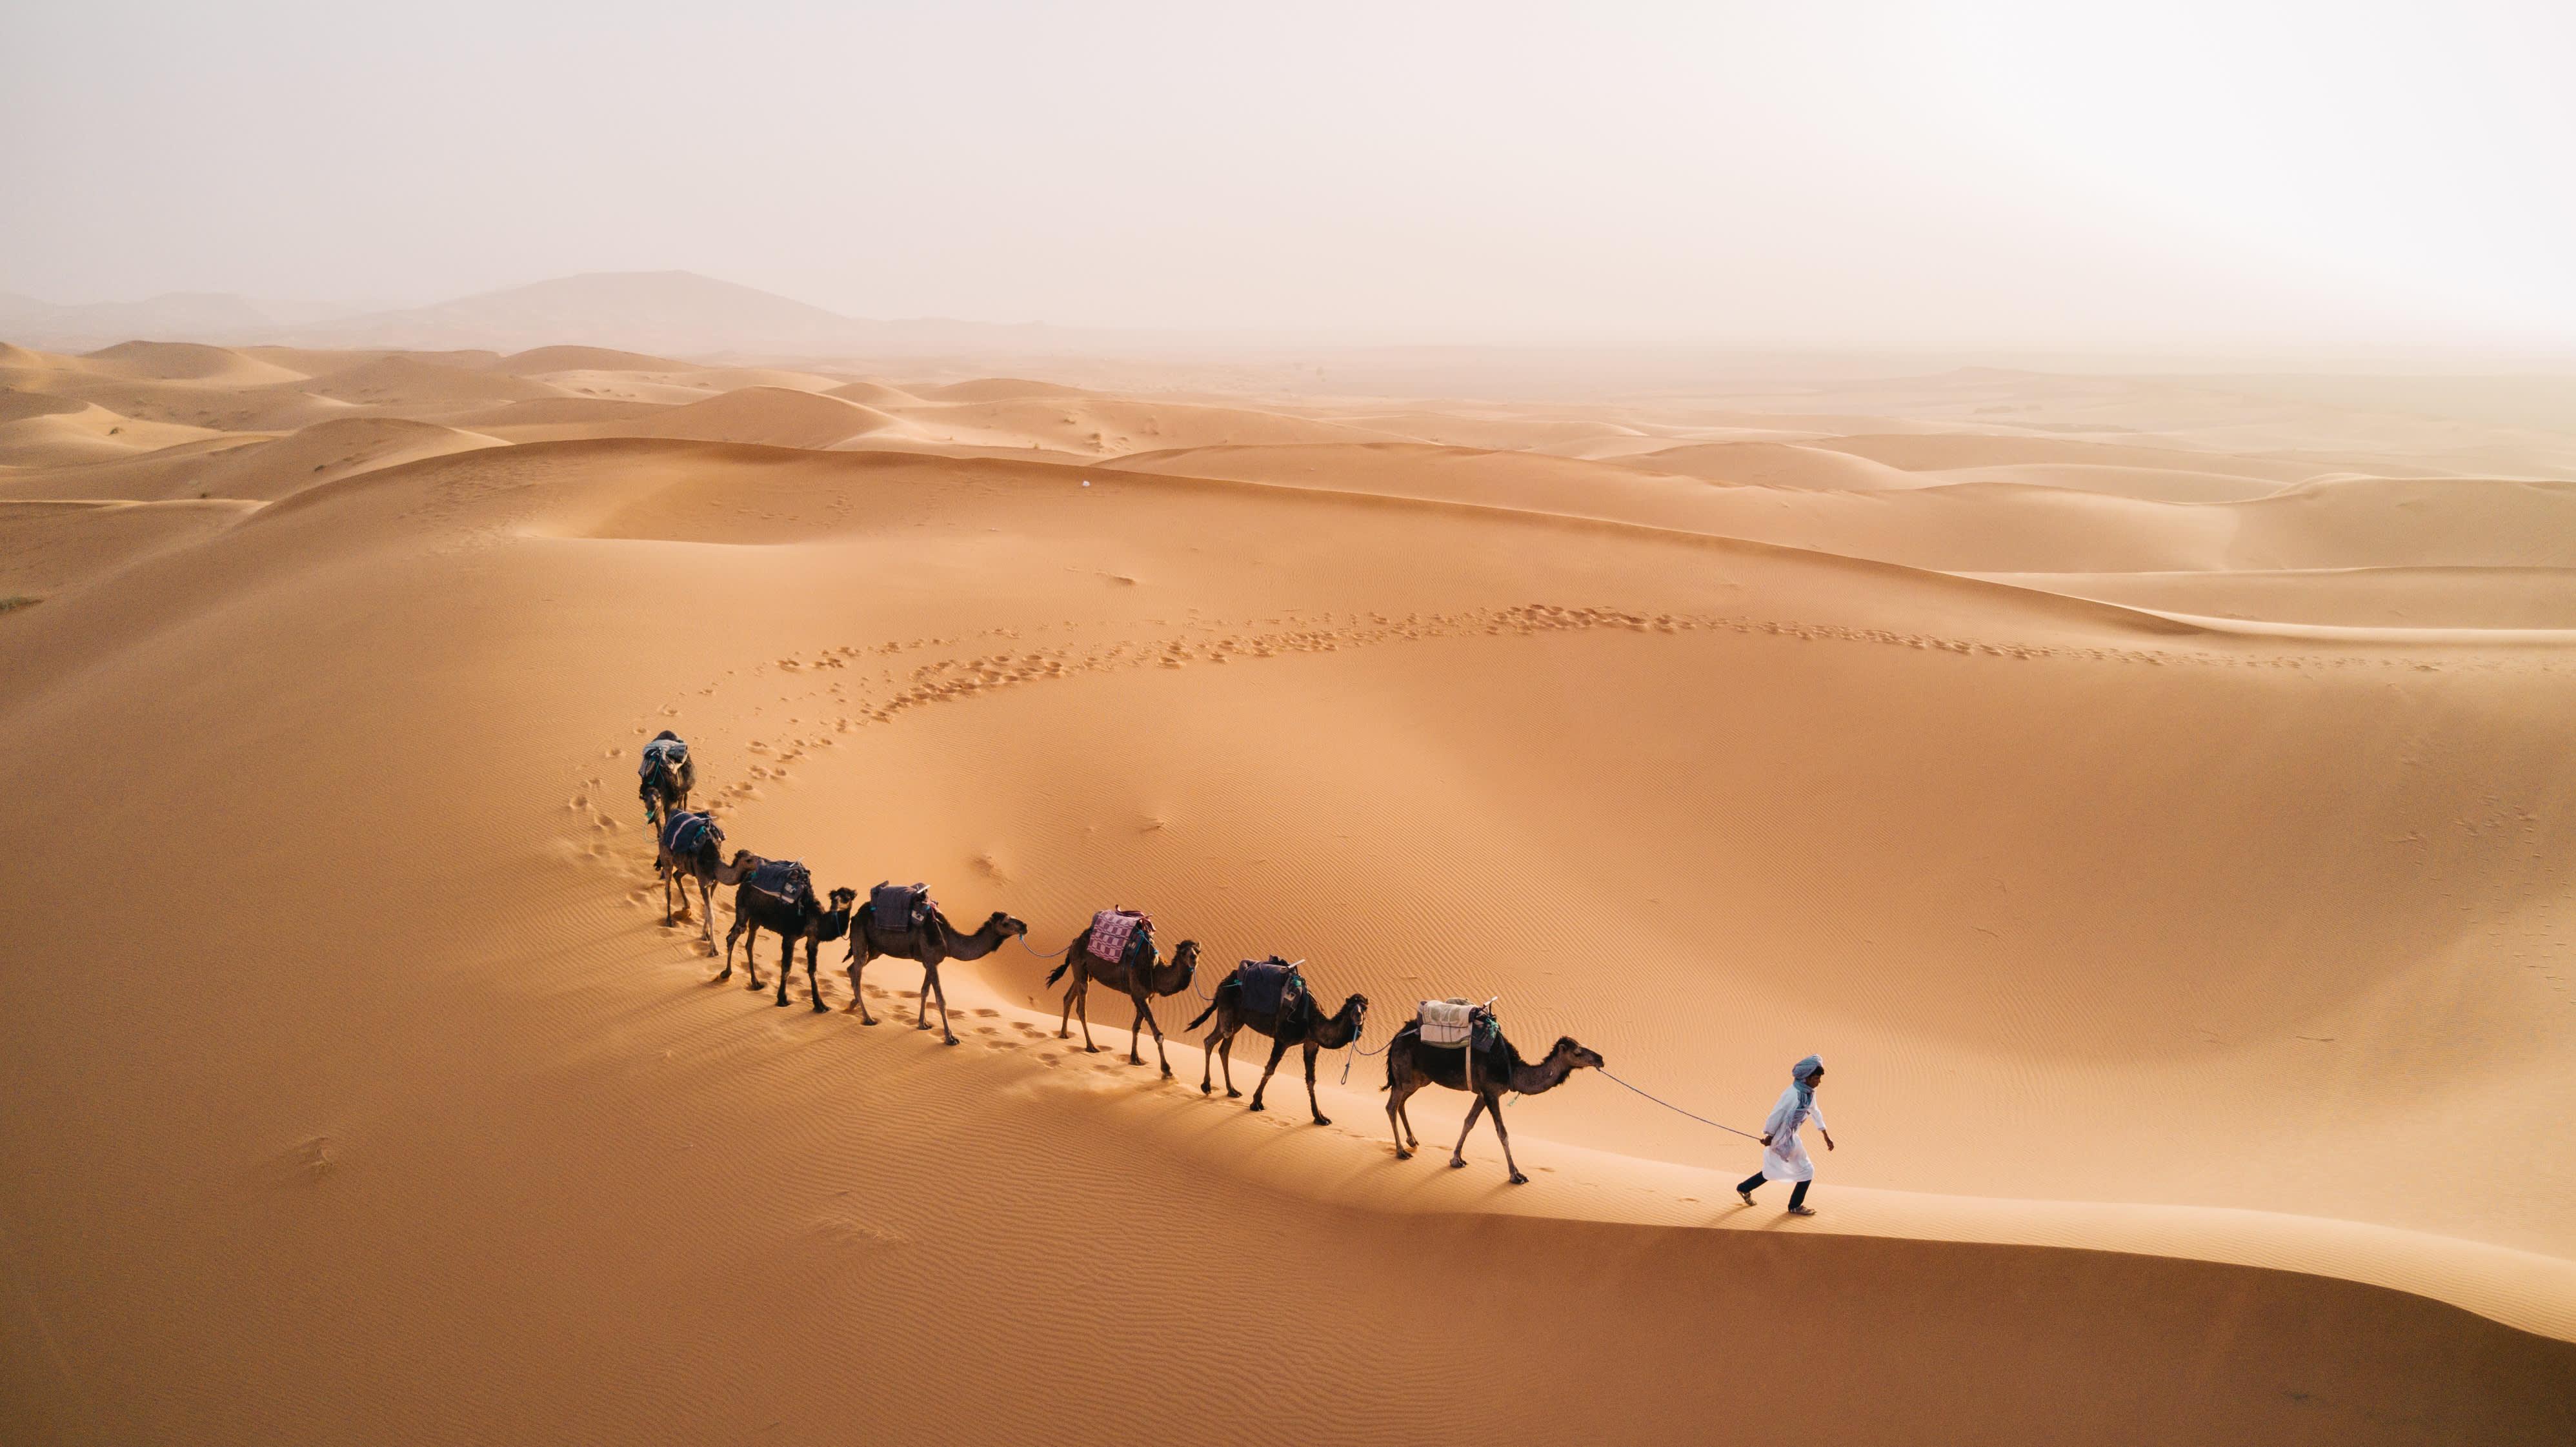 Tuareg with camels walk thru the desert on the Sahara Desert in Morocco.